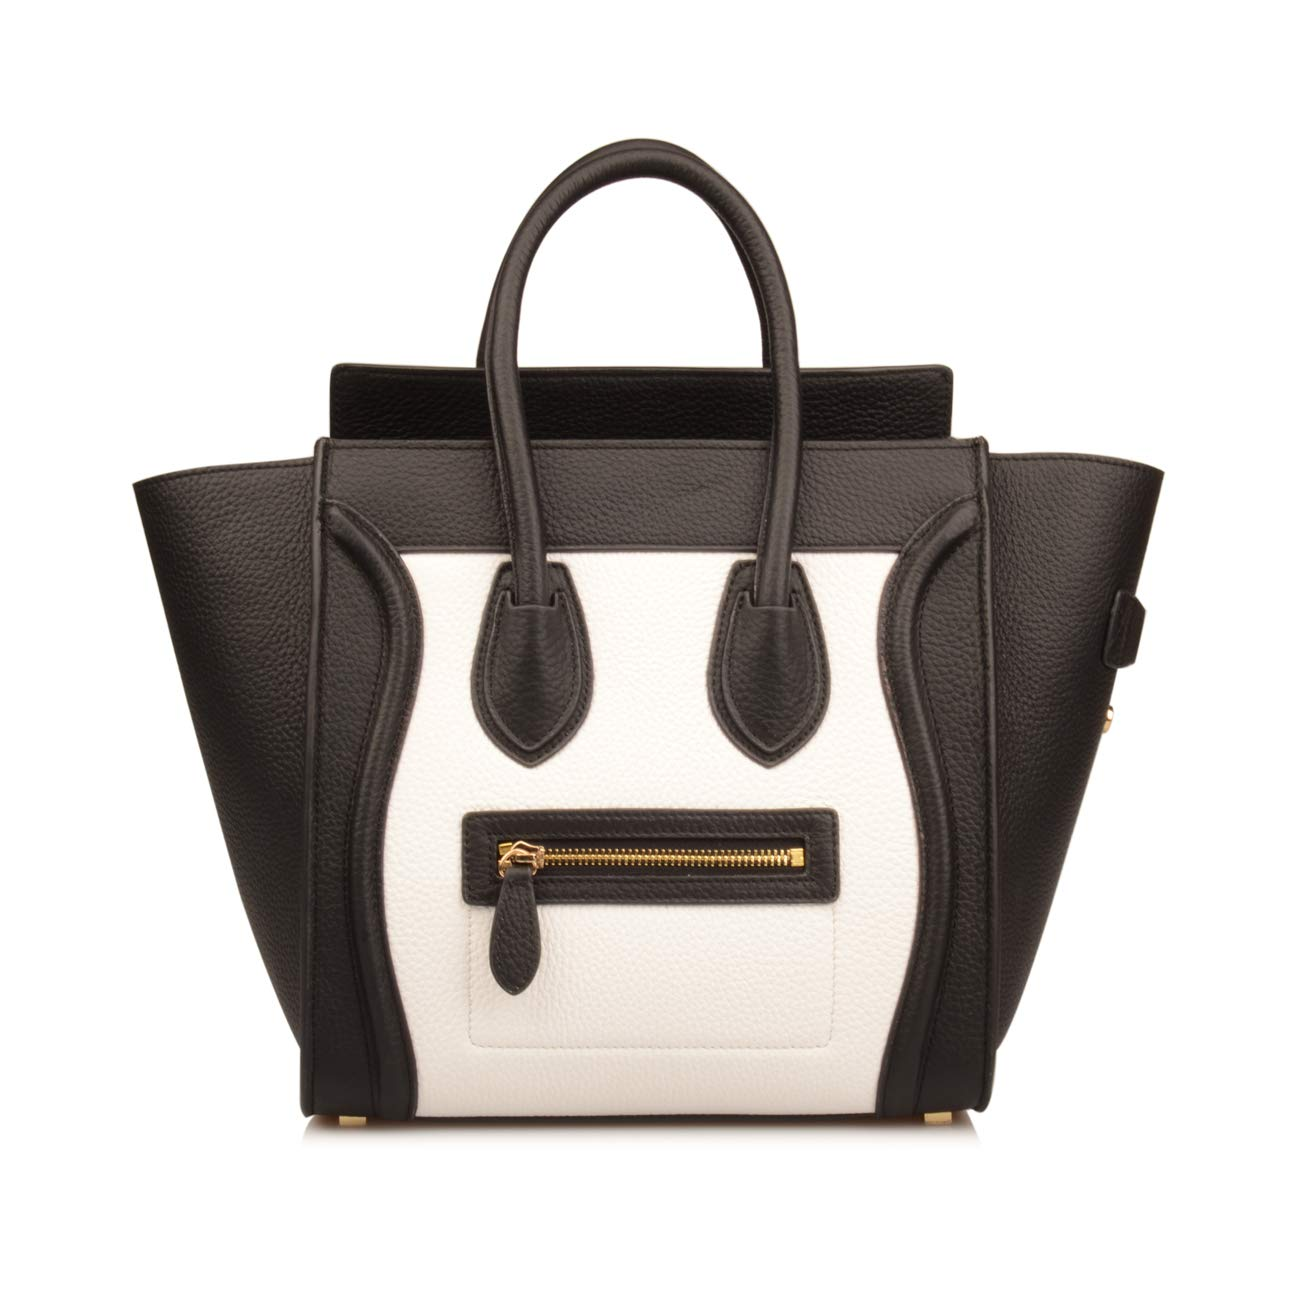 Ainifeel Women's Genuine Leather Smile Top Handle Handbag Purse (Medium, Black/white)